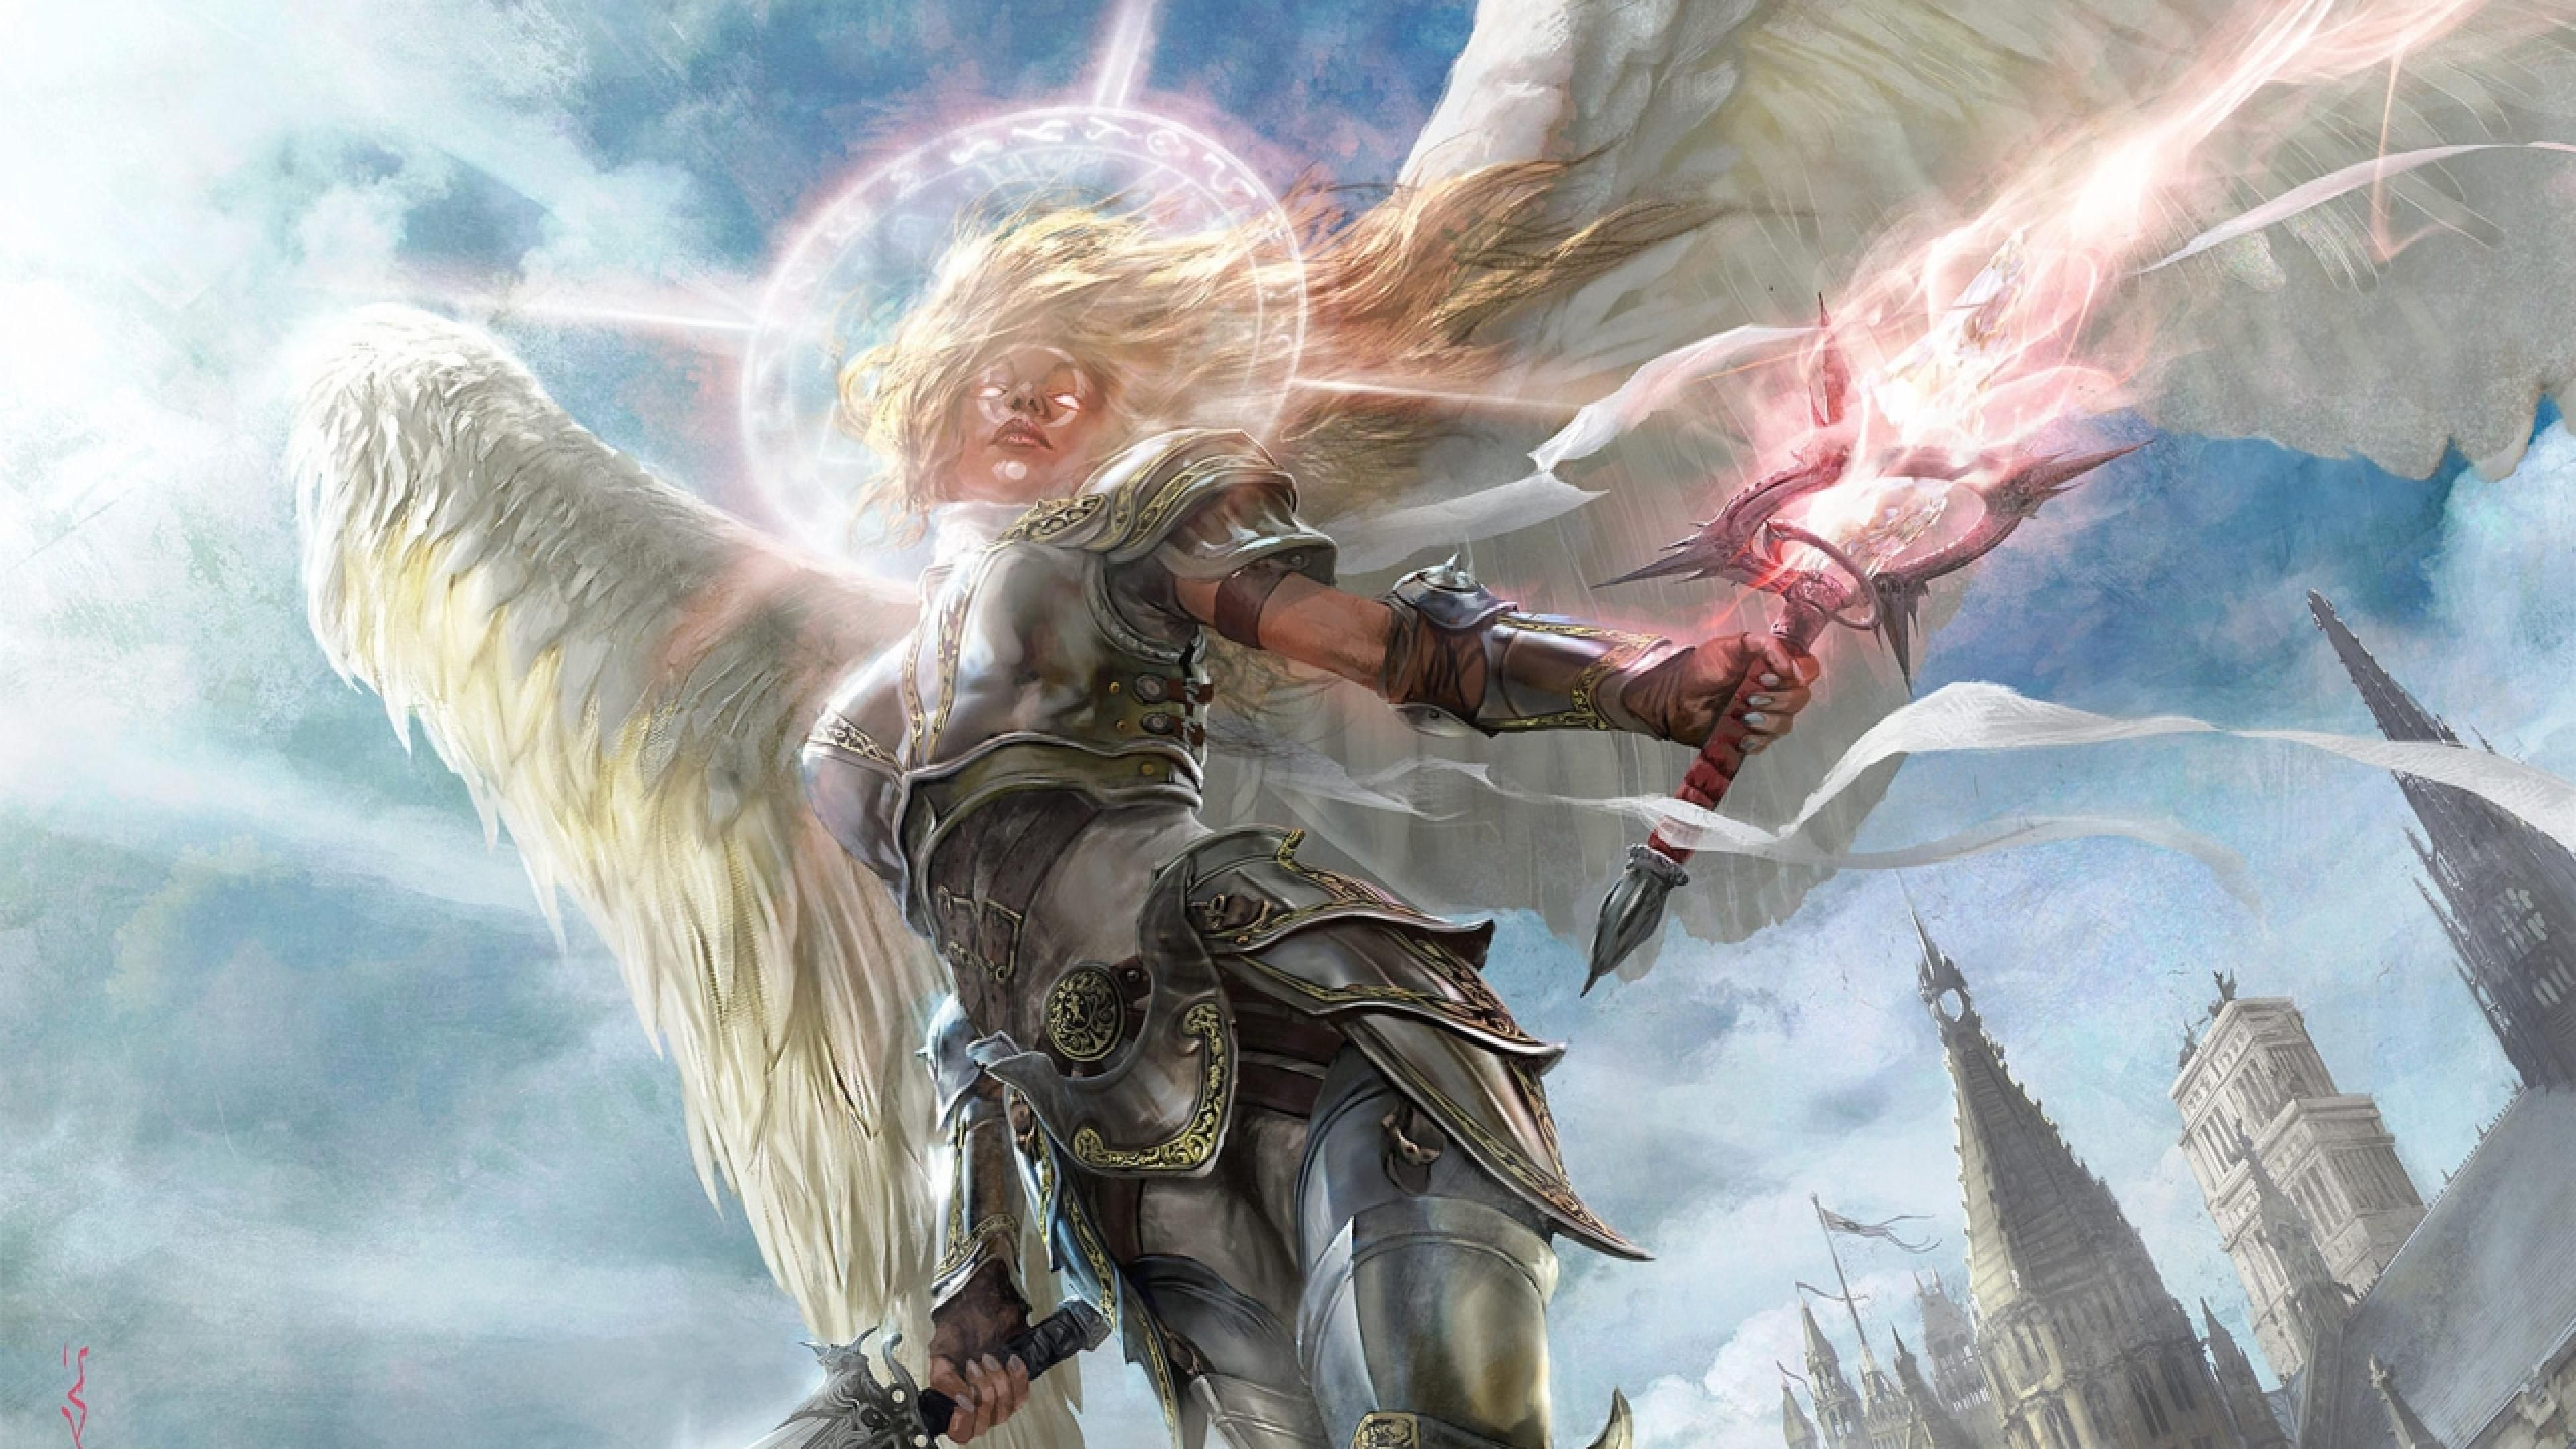 Angel Magic Sword Halo Abstract 4k Angel Magic Sword Halo Abstract 4k Is An Hd Desktop Wallpaper Posted In Our Free Im Angel Art Angel Warrior Fantasy Artist